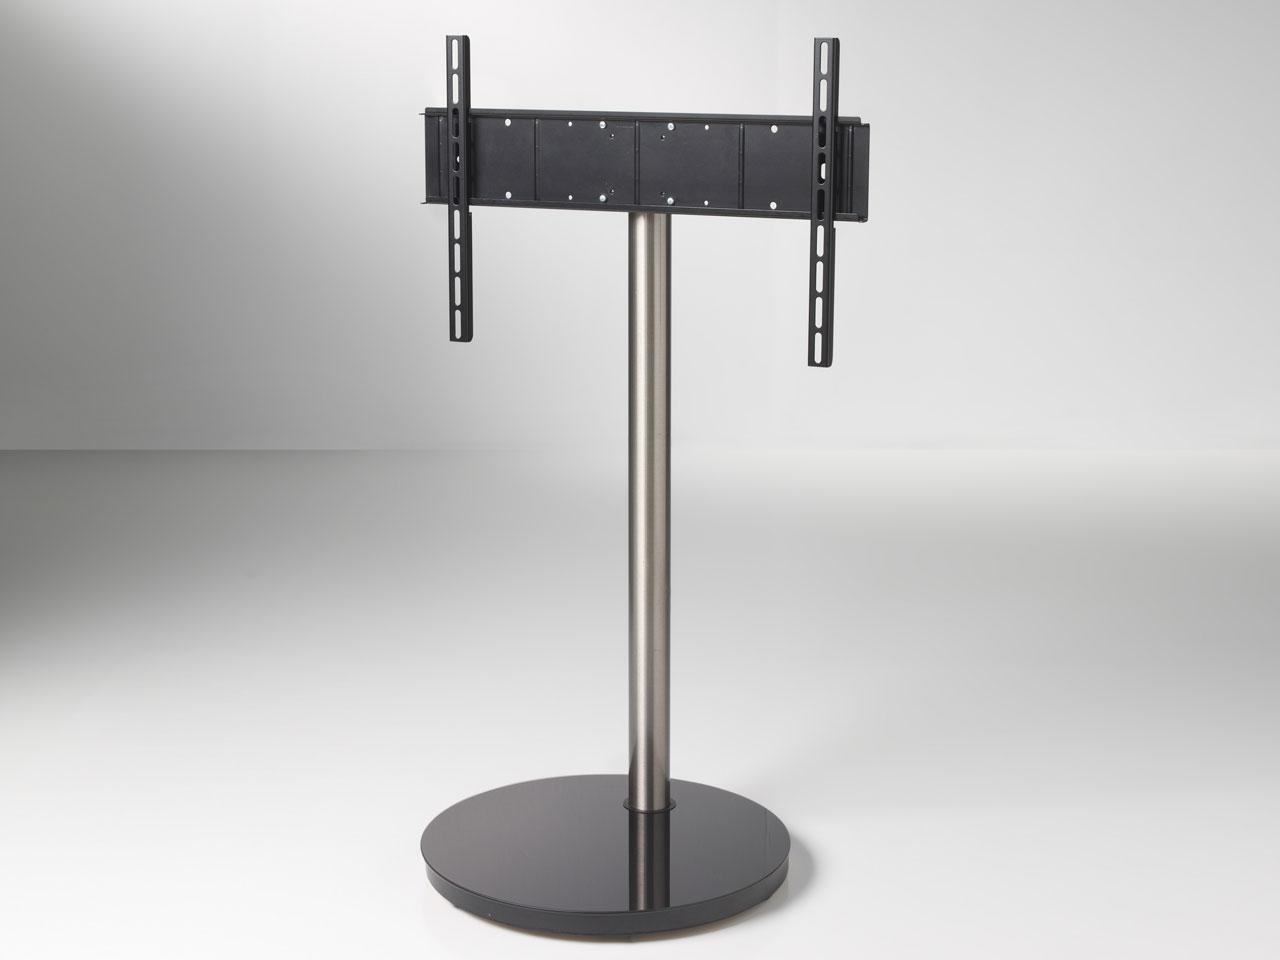 schwenkbarer tv st nder runder standboden cmb 207 23 65 zoll g nstig kaufen cmb systeme. Black Bedroom Furniture Sets. Home Design Ideas